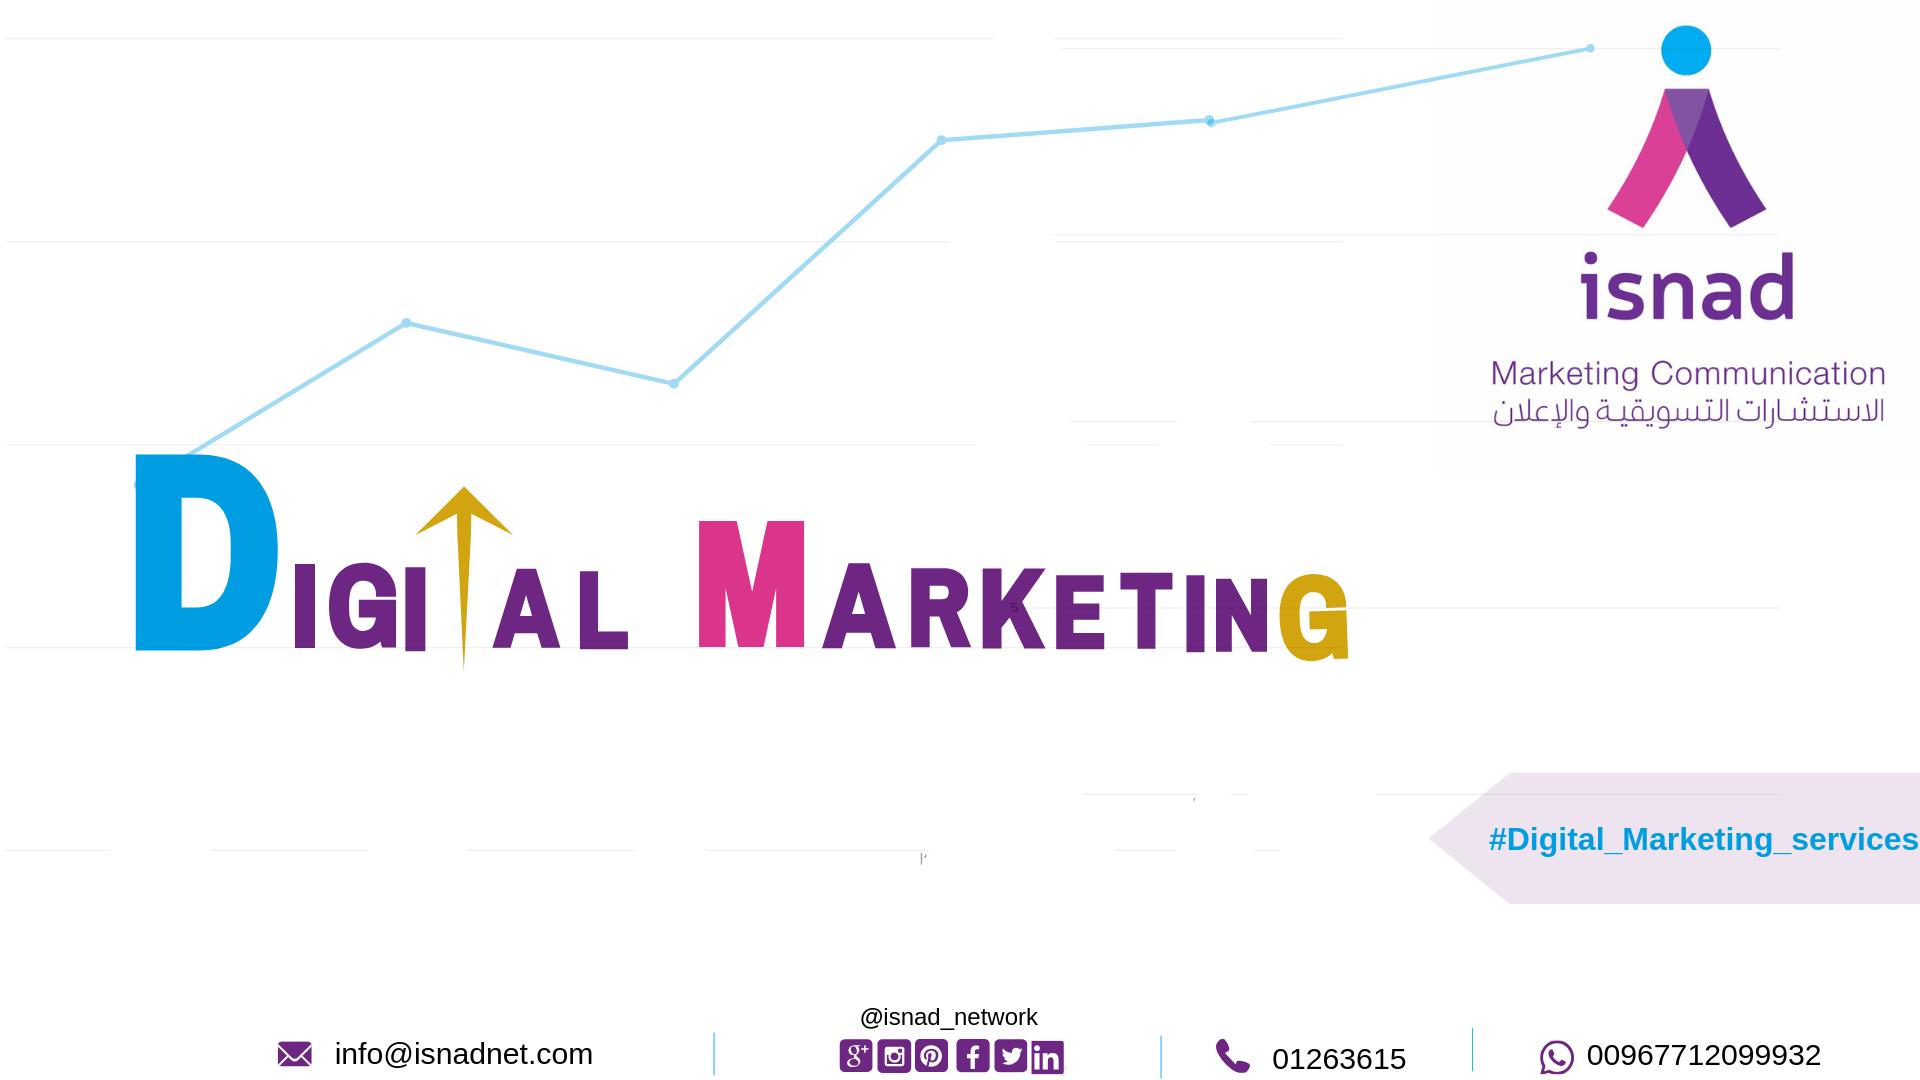 Digital Marketing Digital Marketing Marketing Digital